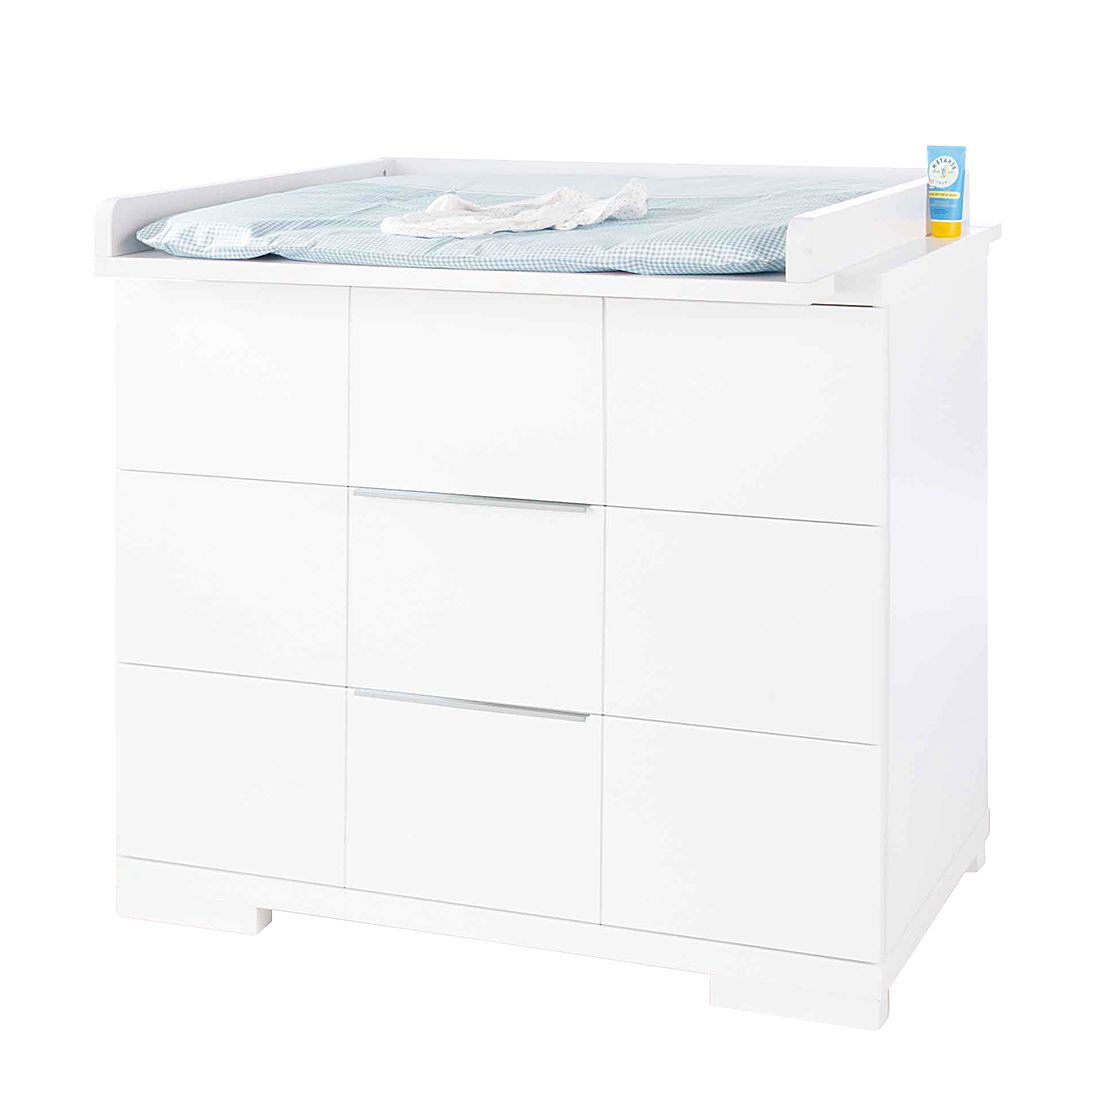 Wickelkommode Polar - Lack Weiß (Wickelkommode ´Polar´ breit)